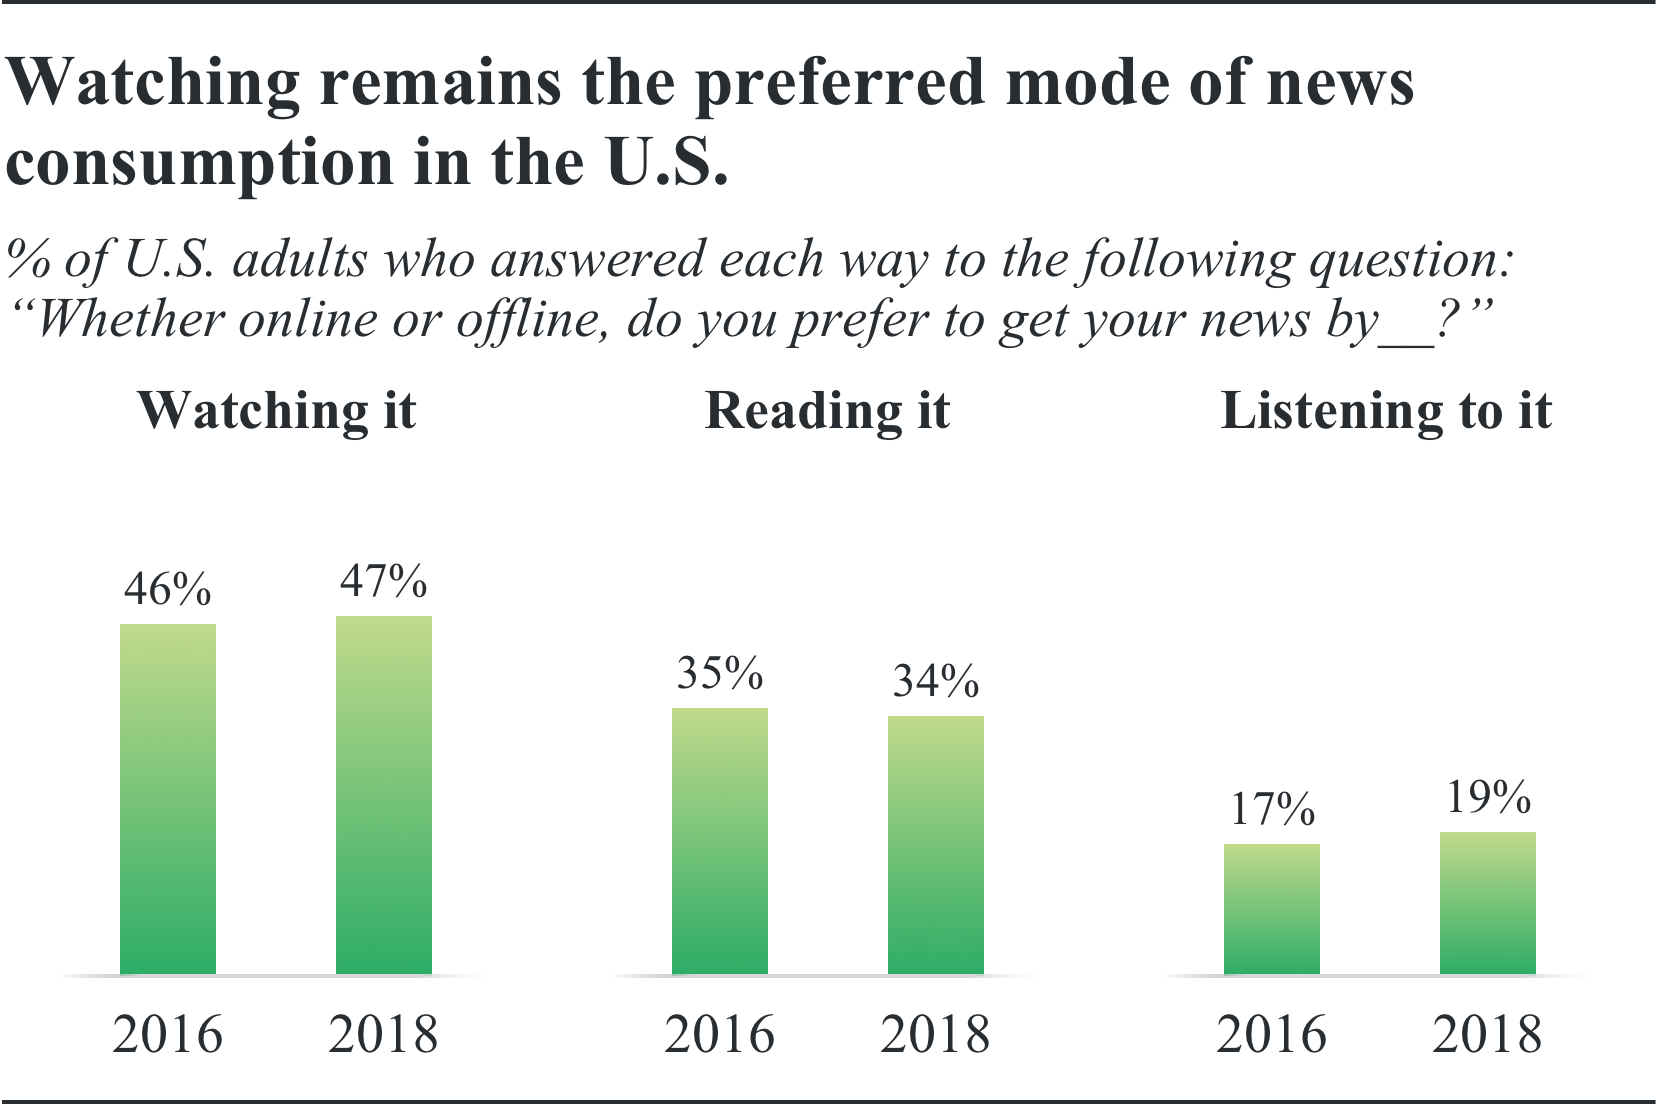 Graphic, How do you prefer to get your news online, offline.